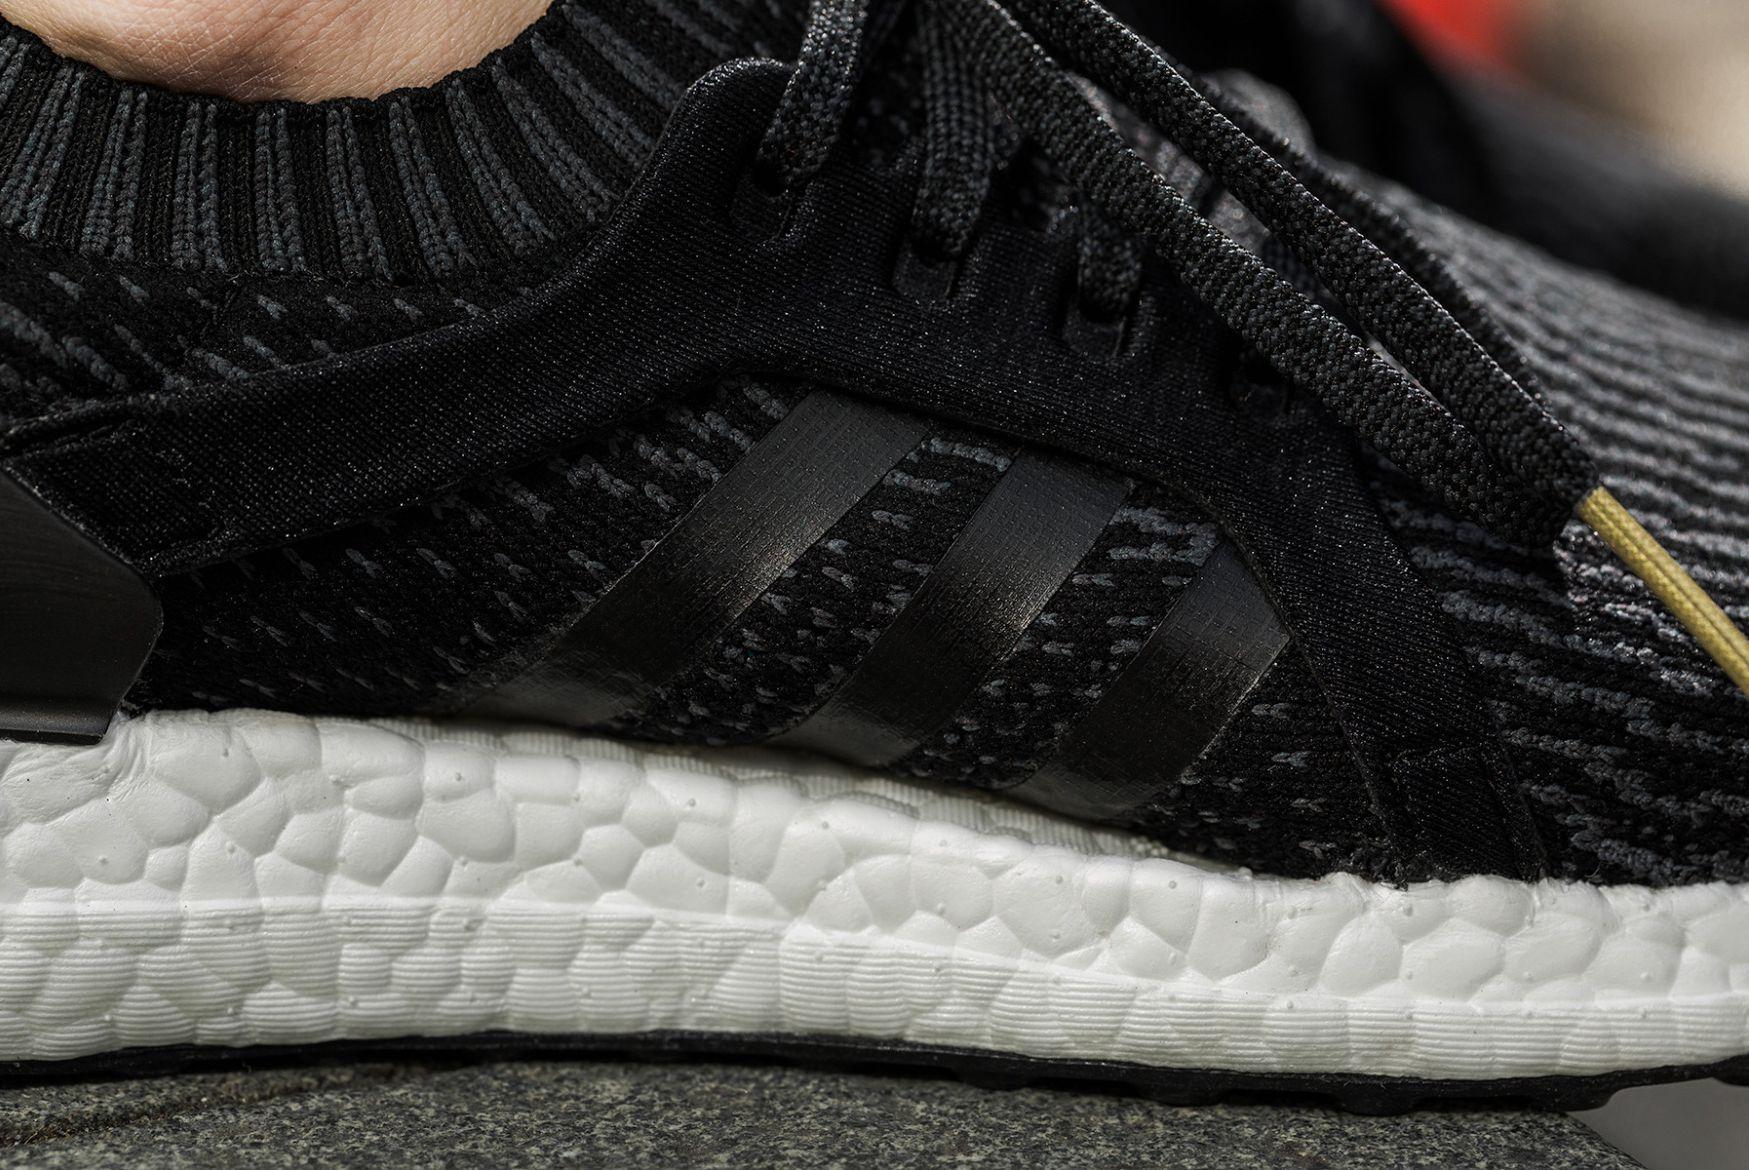 Adidas Ultraboost X Closer Look 7